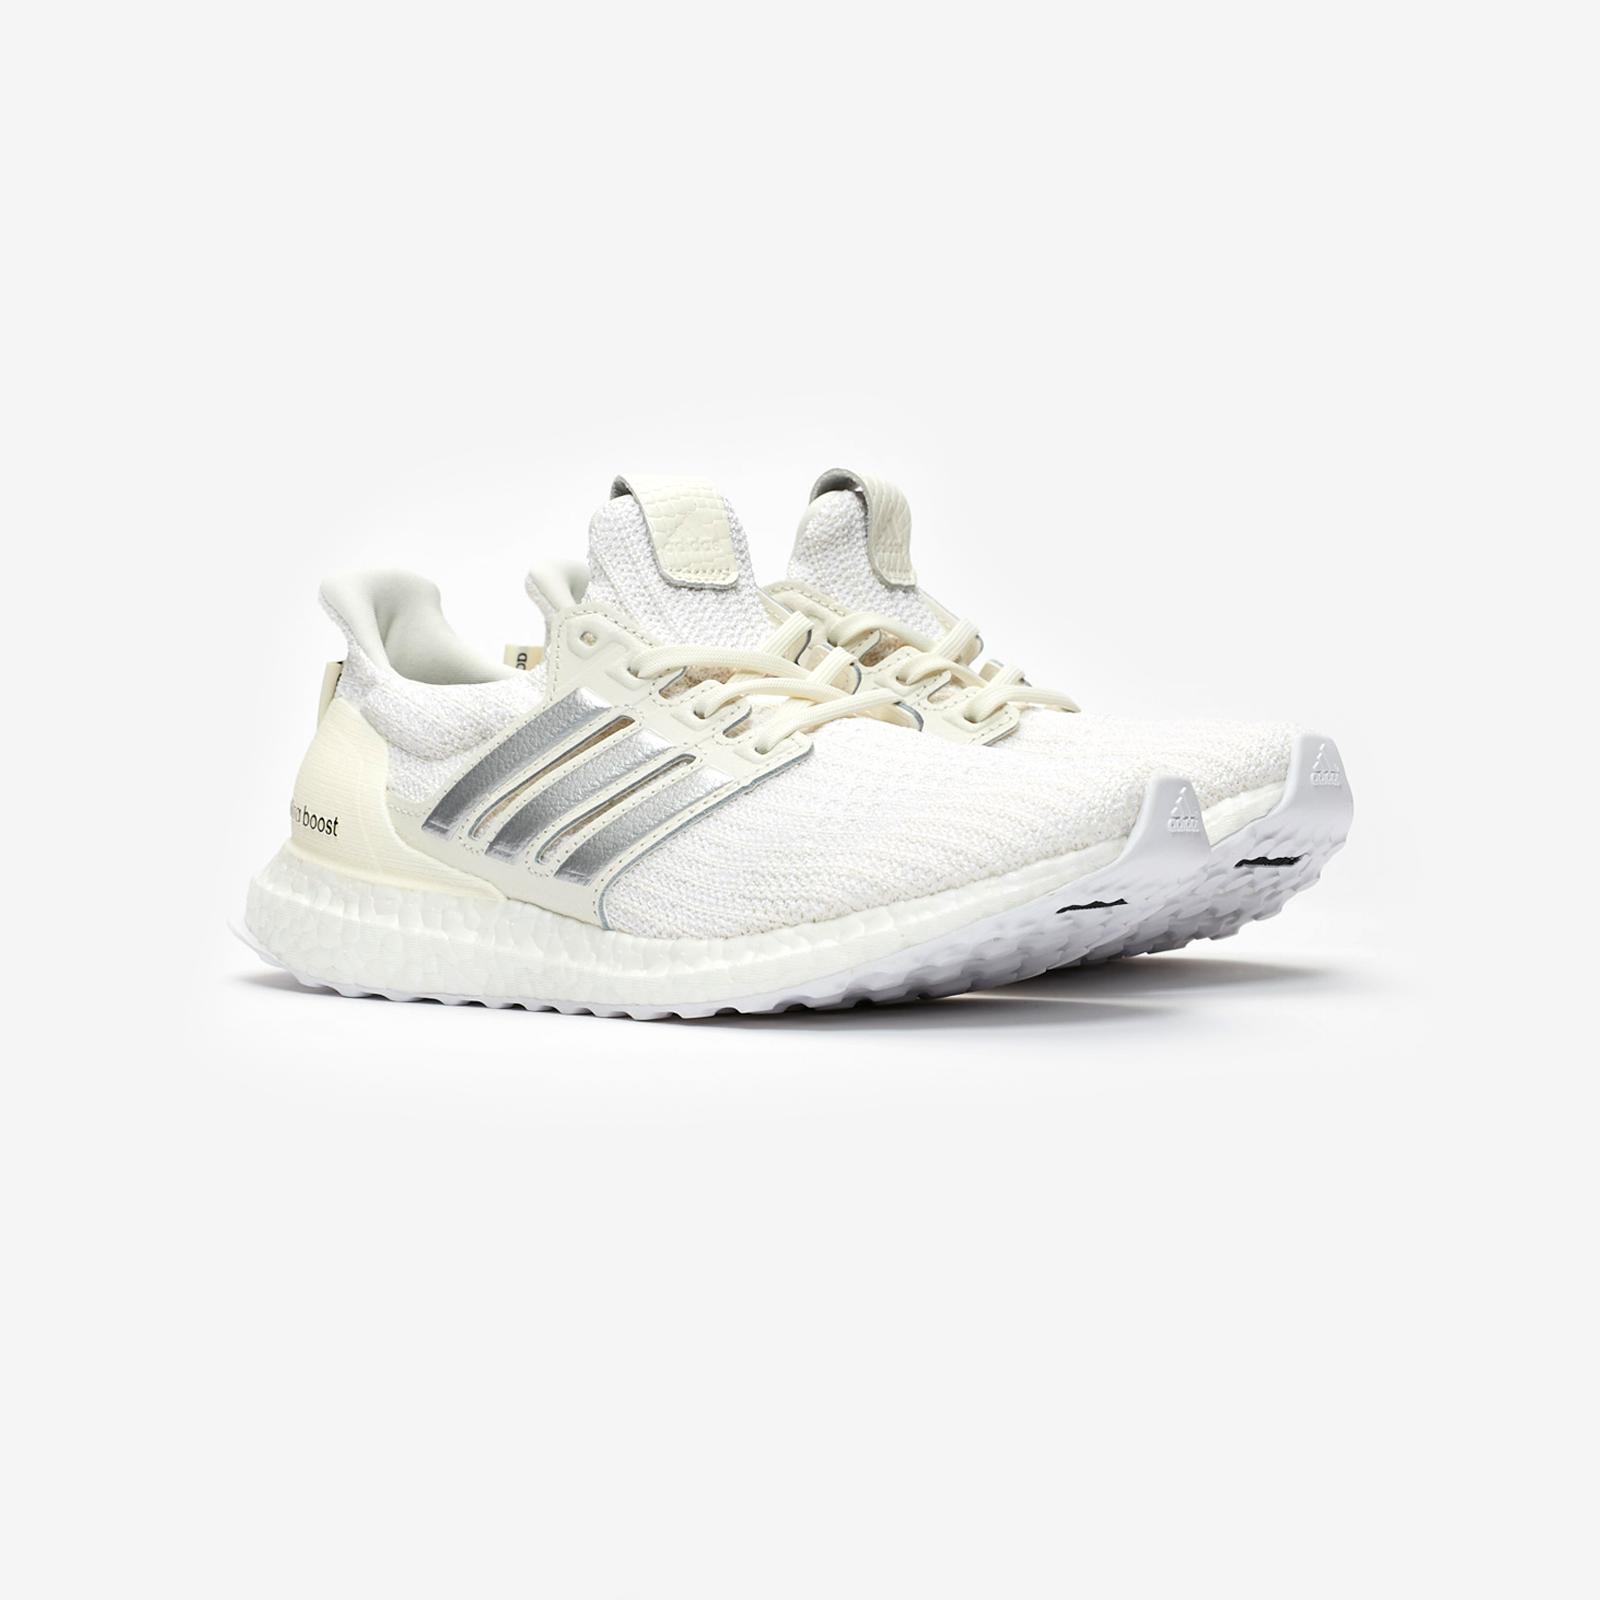 96b8abaaac1 adidas Ultraboost W x Game of Thrones - Ee3711 - Sneakersnstuff ...